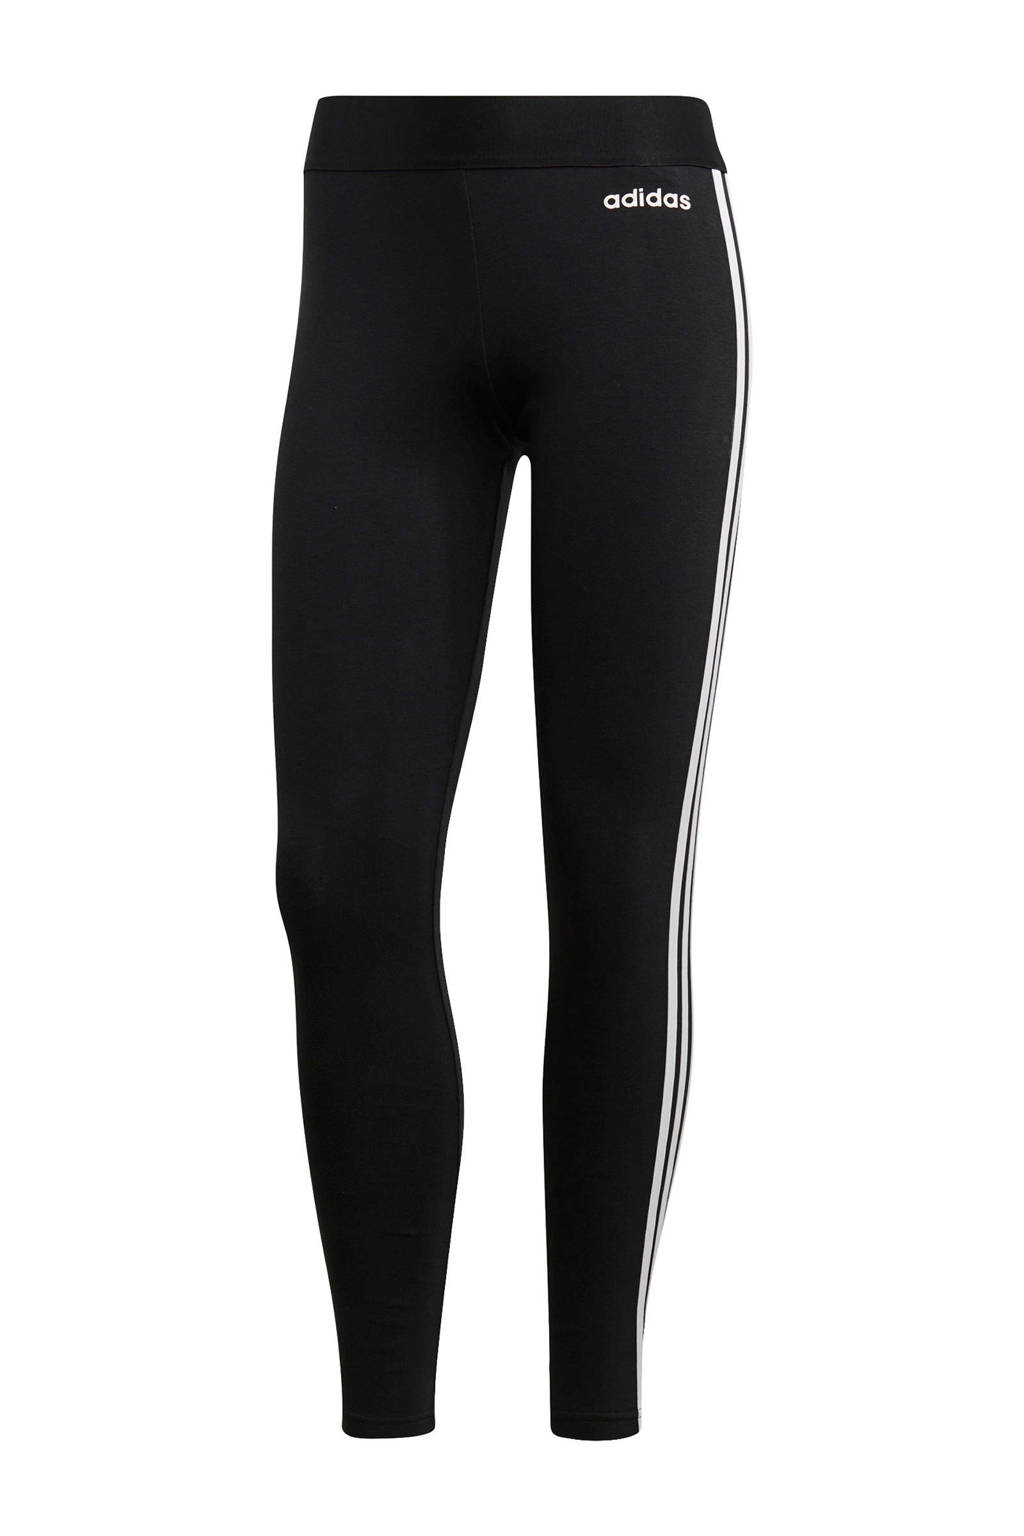 adidas Performance 7/8 sportbroek zwart, Zwart